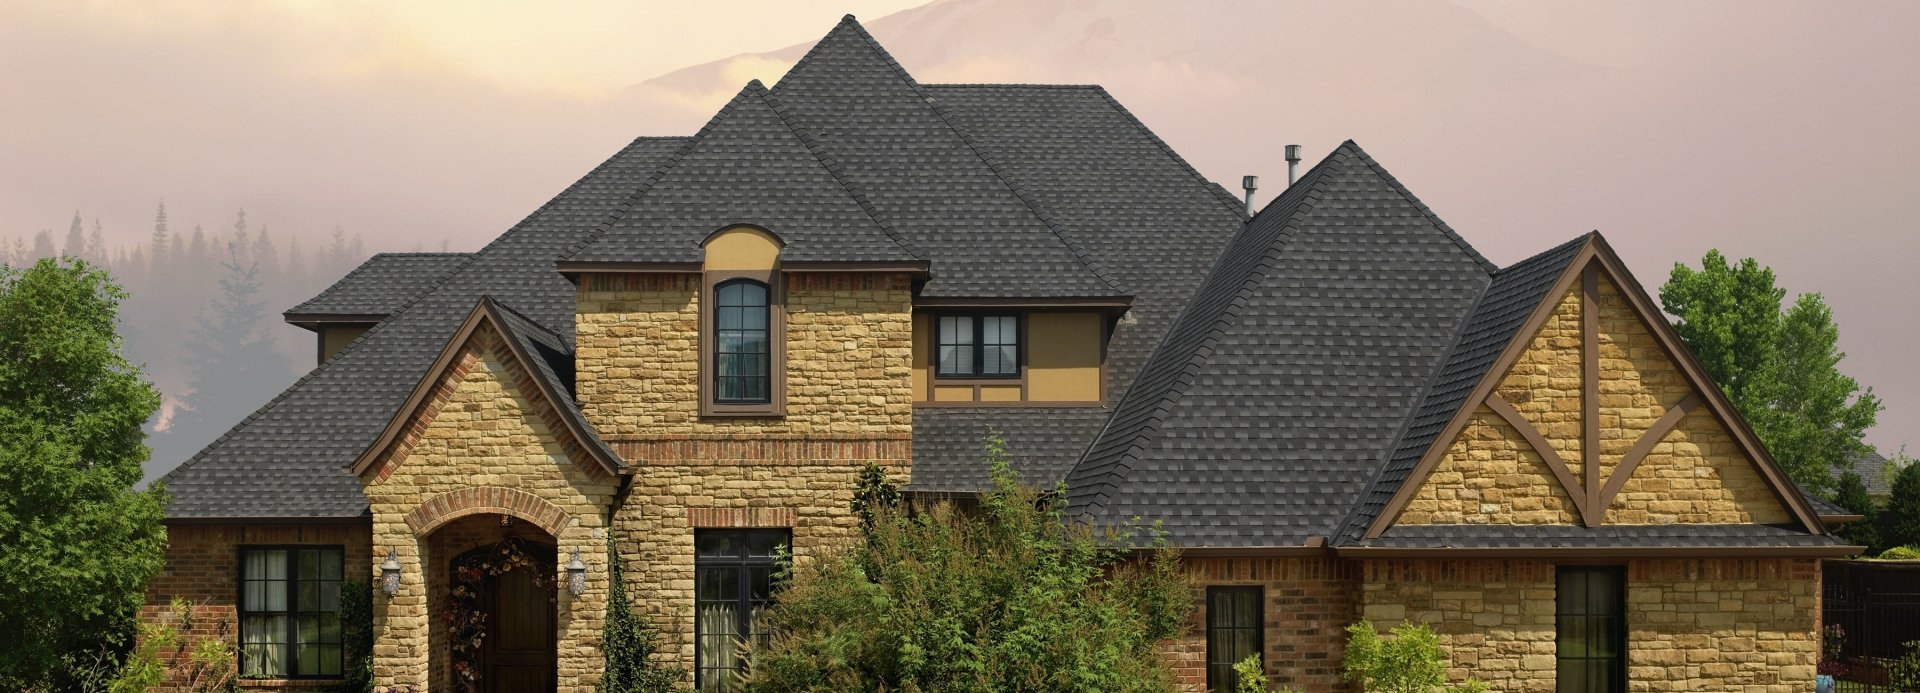 Roof Repair Bountiful Ut Lloyd S Quality Roofing